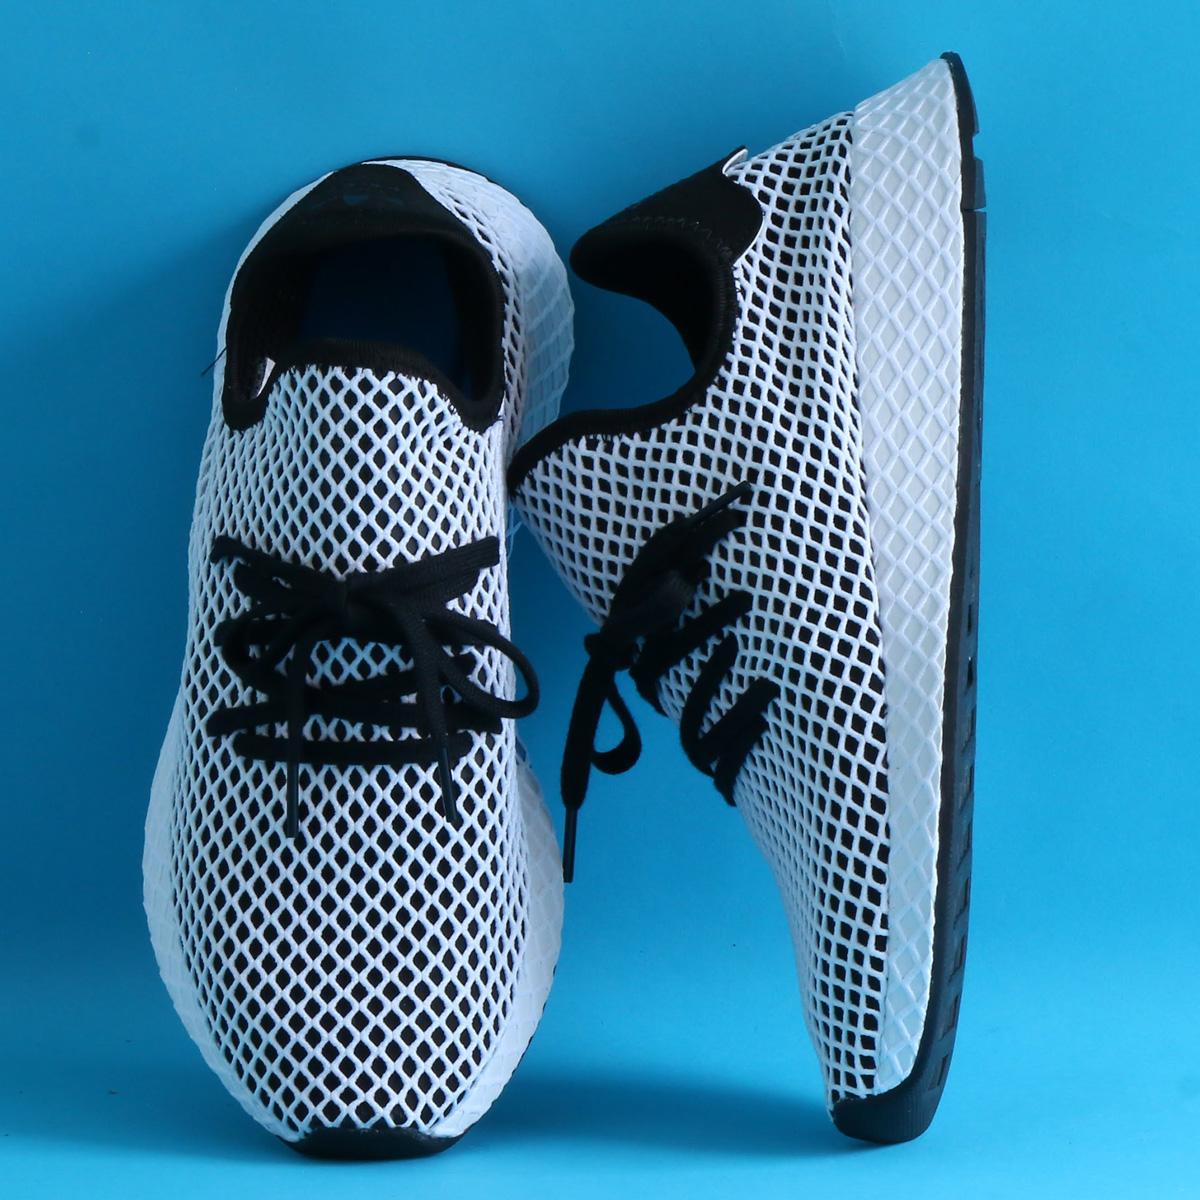 adidas Originals DEERUPT RUNNER (アディダス オリジナルス ディーラプト ランナー)Core Black/Core Black/Running White【メンズ レディース スニーカー】18SS-S